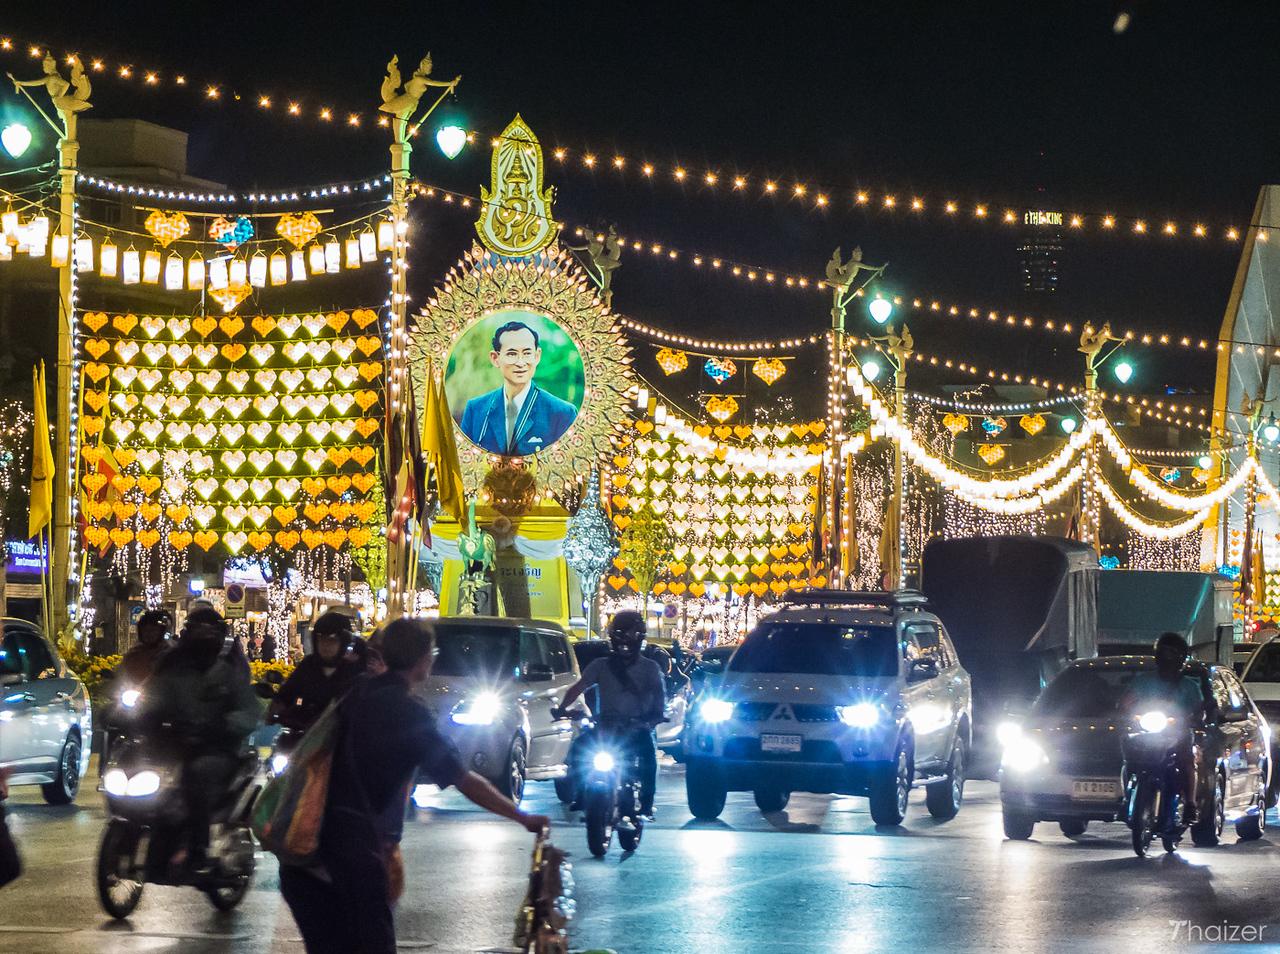 illuminations in Bangkok for HM the King's birthday